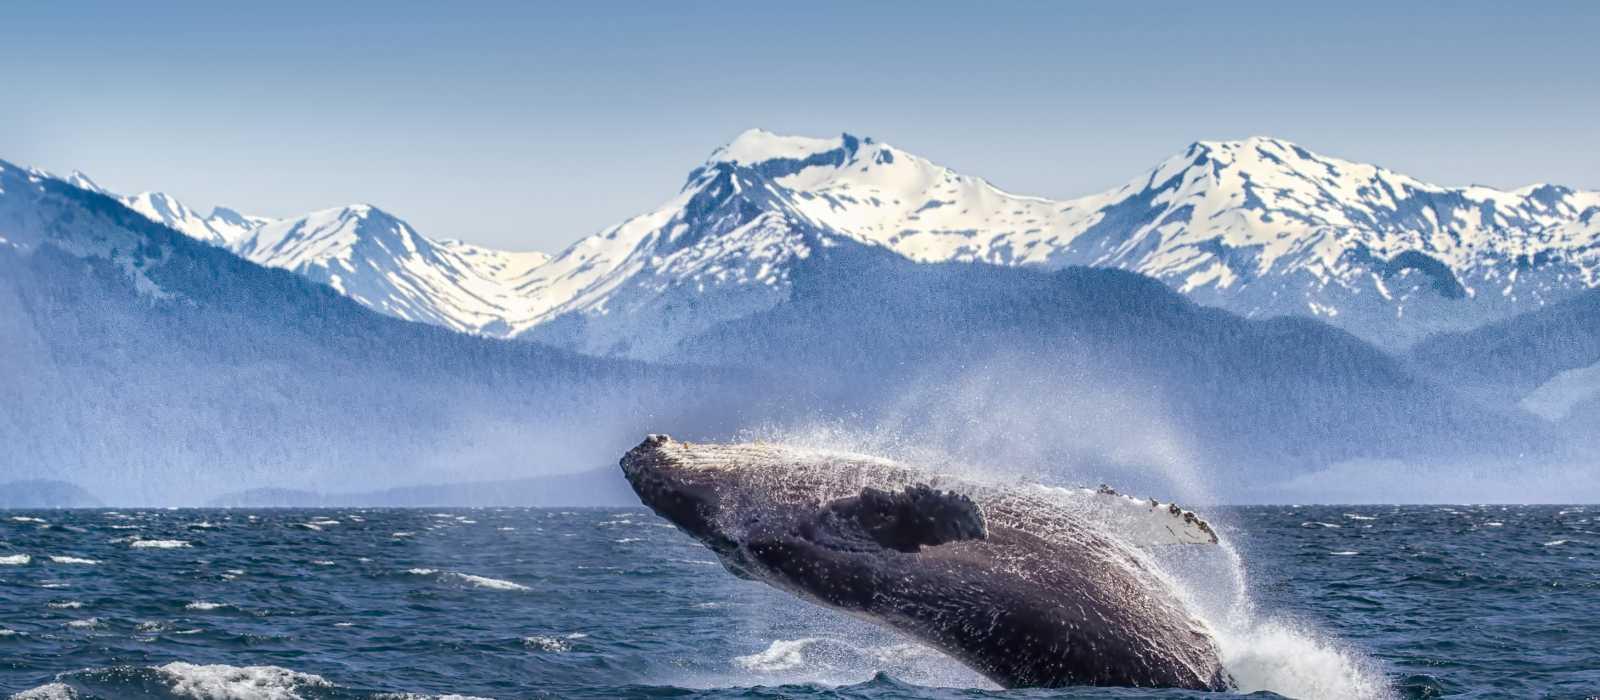 Whale Watching- Alaska